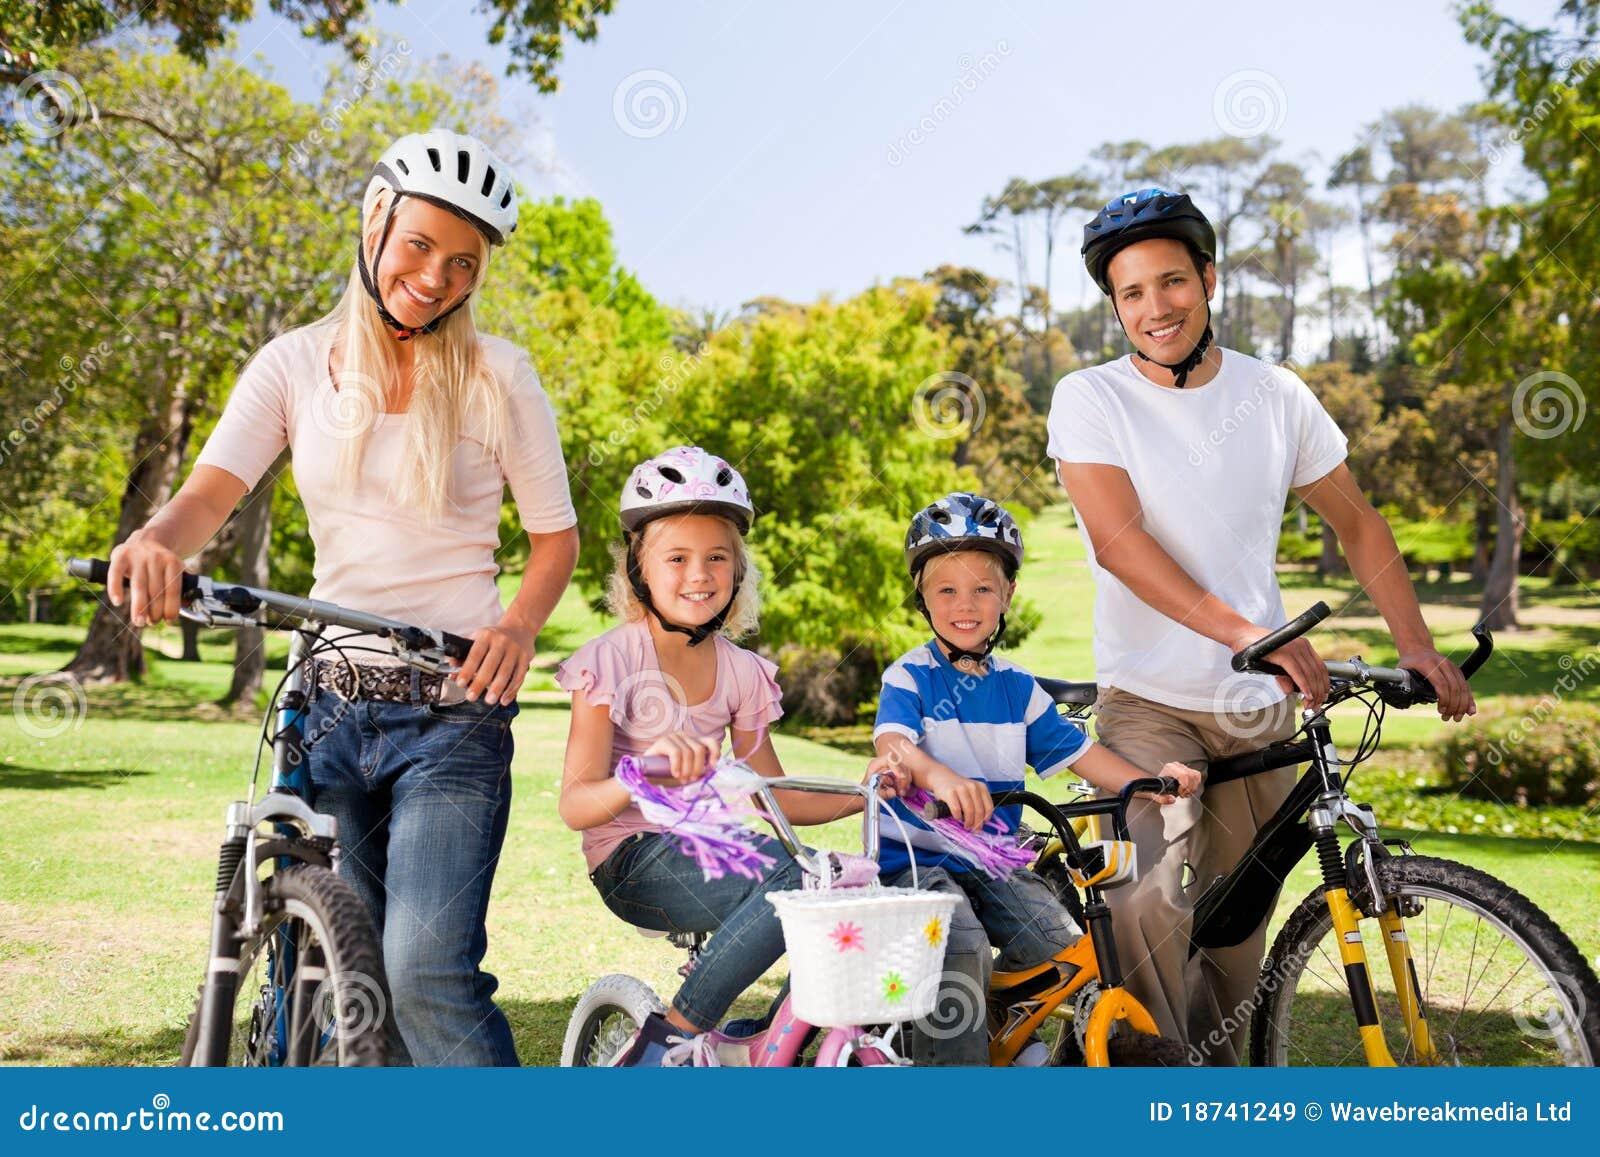 Free family fun center business plan